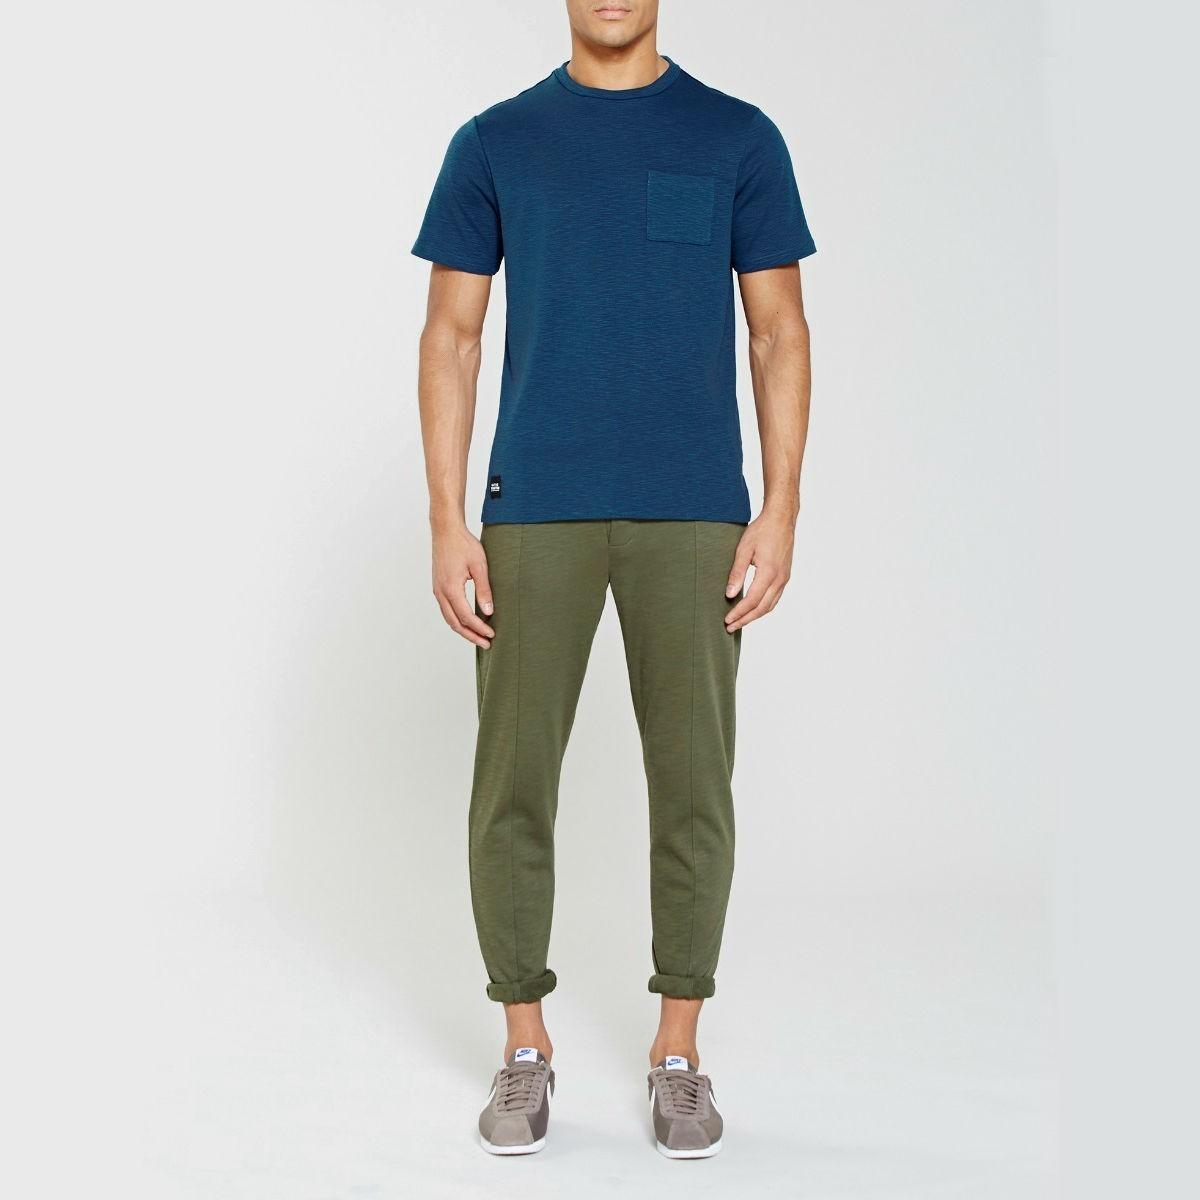 Modré tričko – Marton – XL